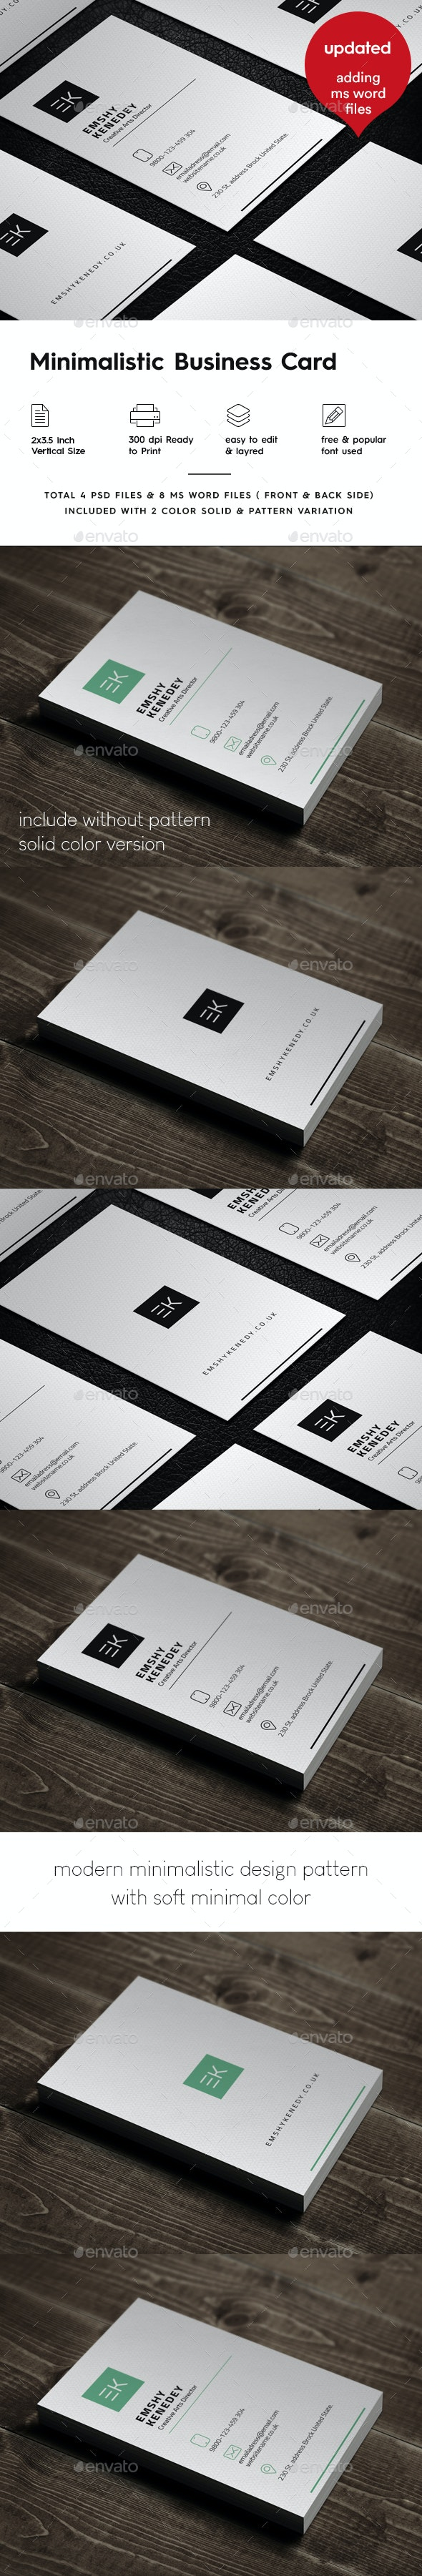 Minimal Modern Business Card - Business Cards Print Templates